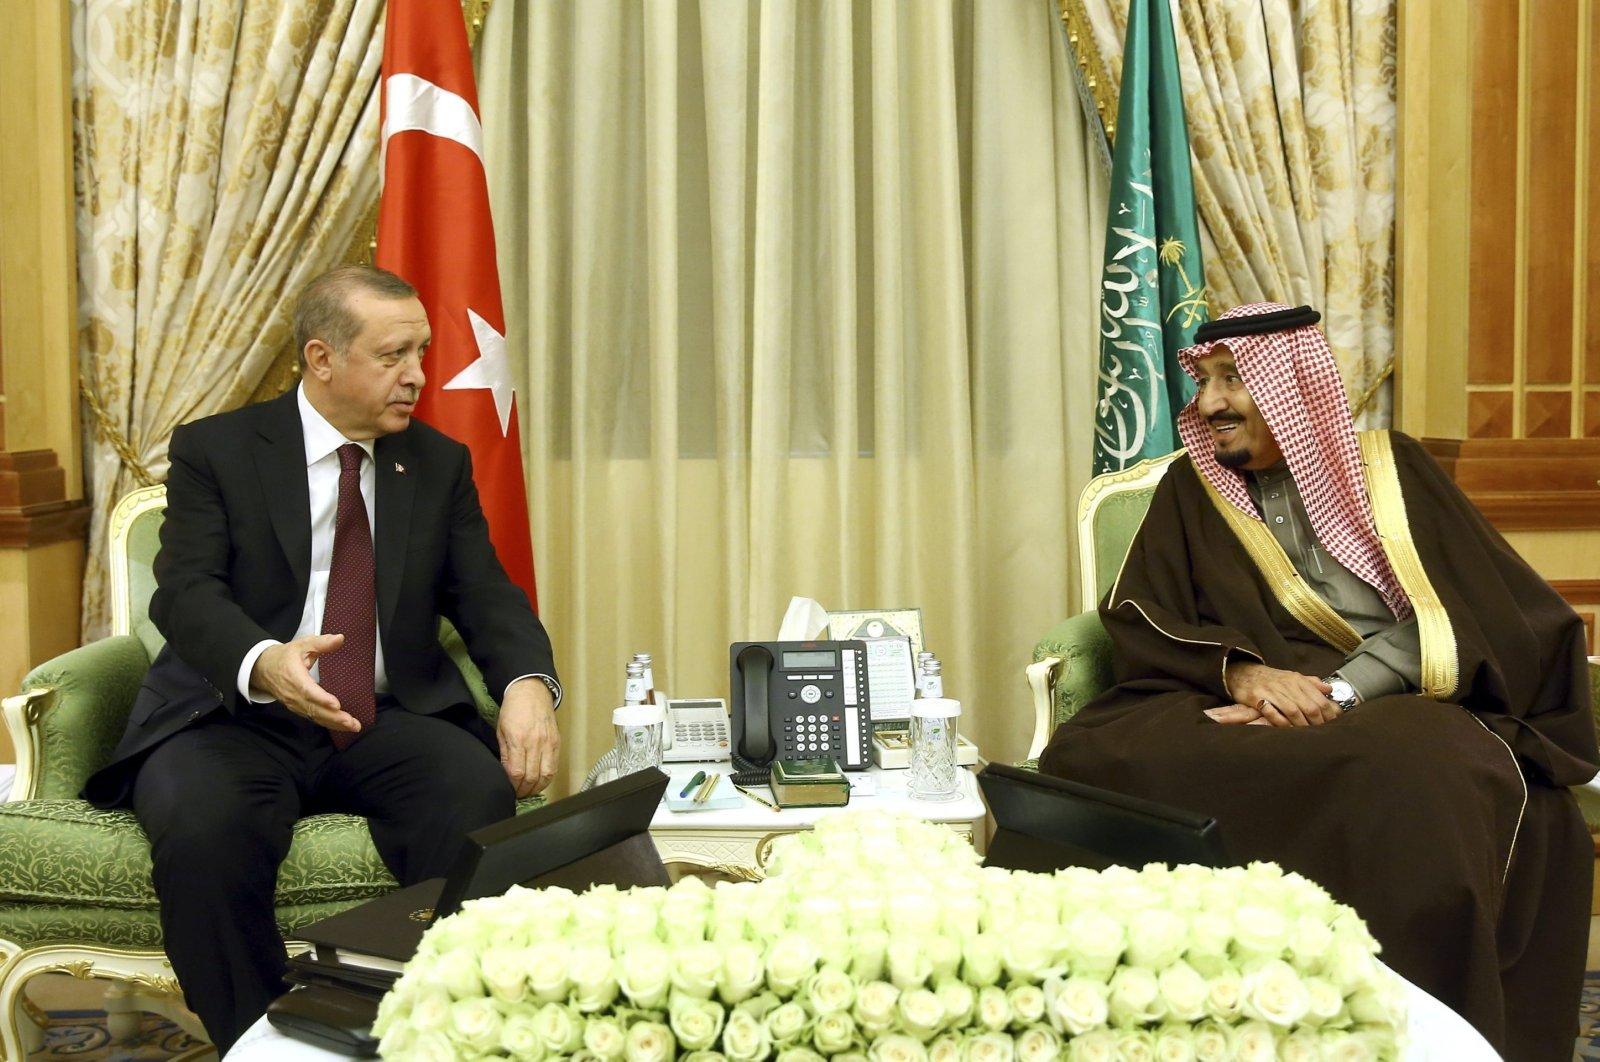 Erdoğan, King Salman discuss Turkey-Saudi relations in call